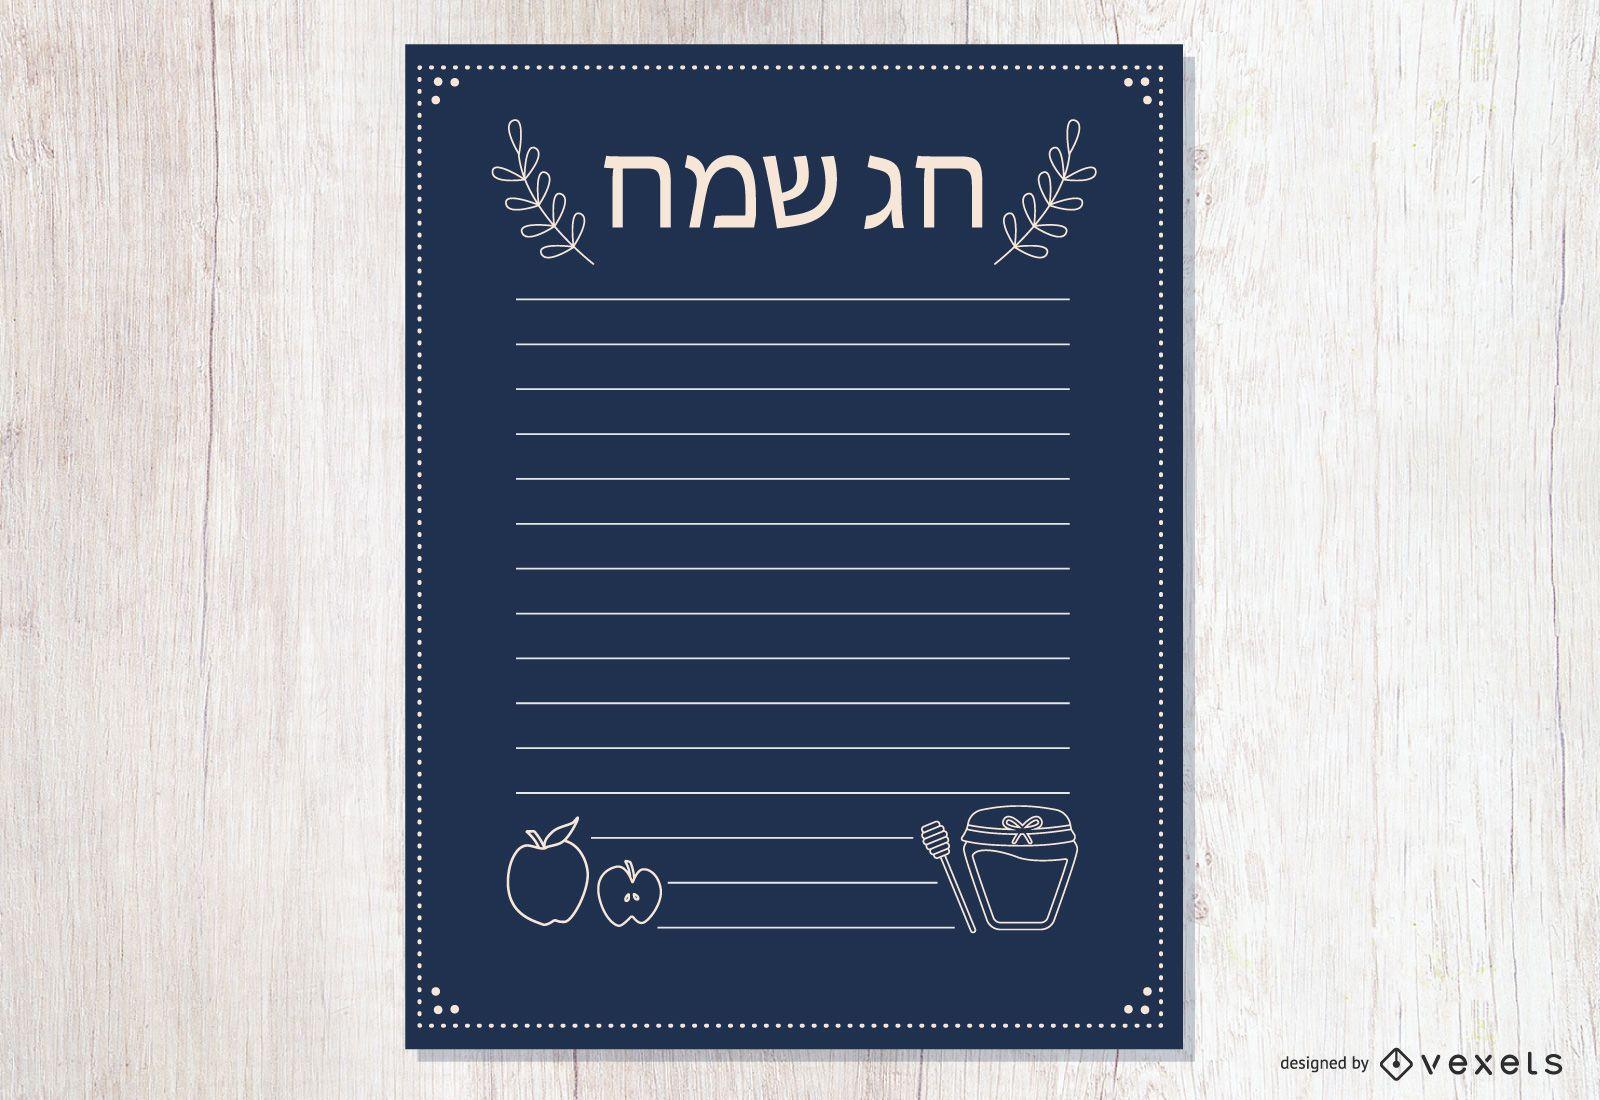 Rosh Hashanah Blank Note Template